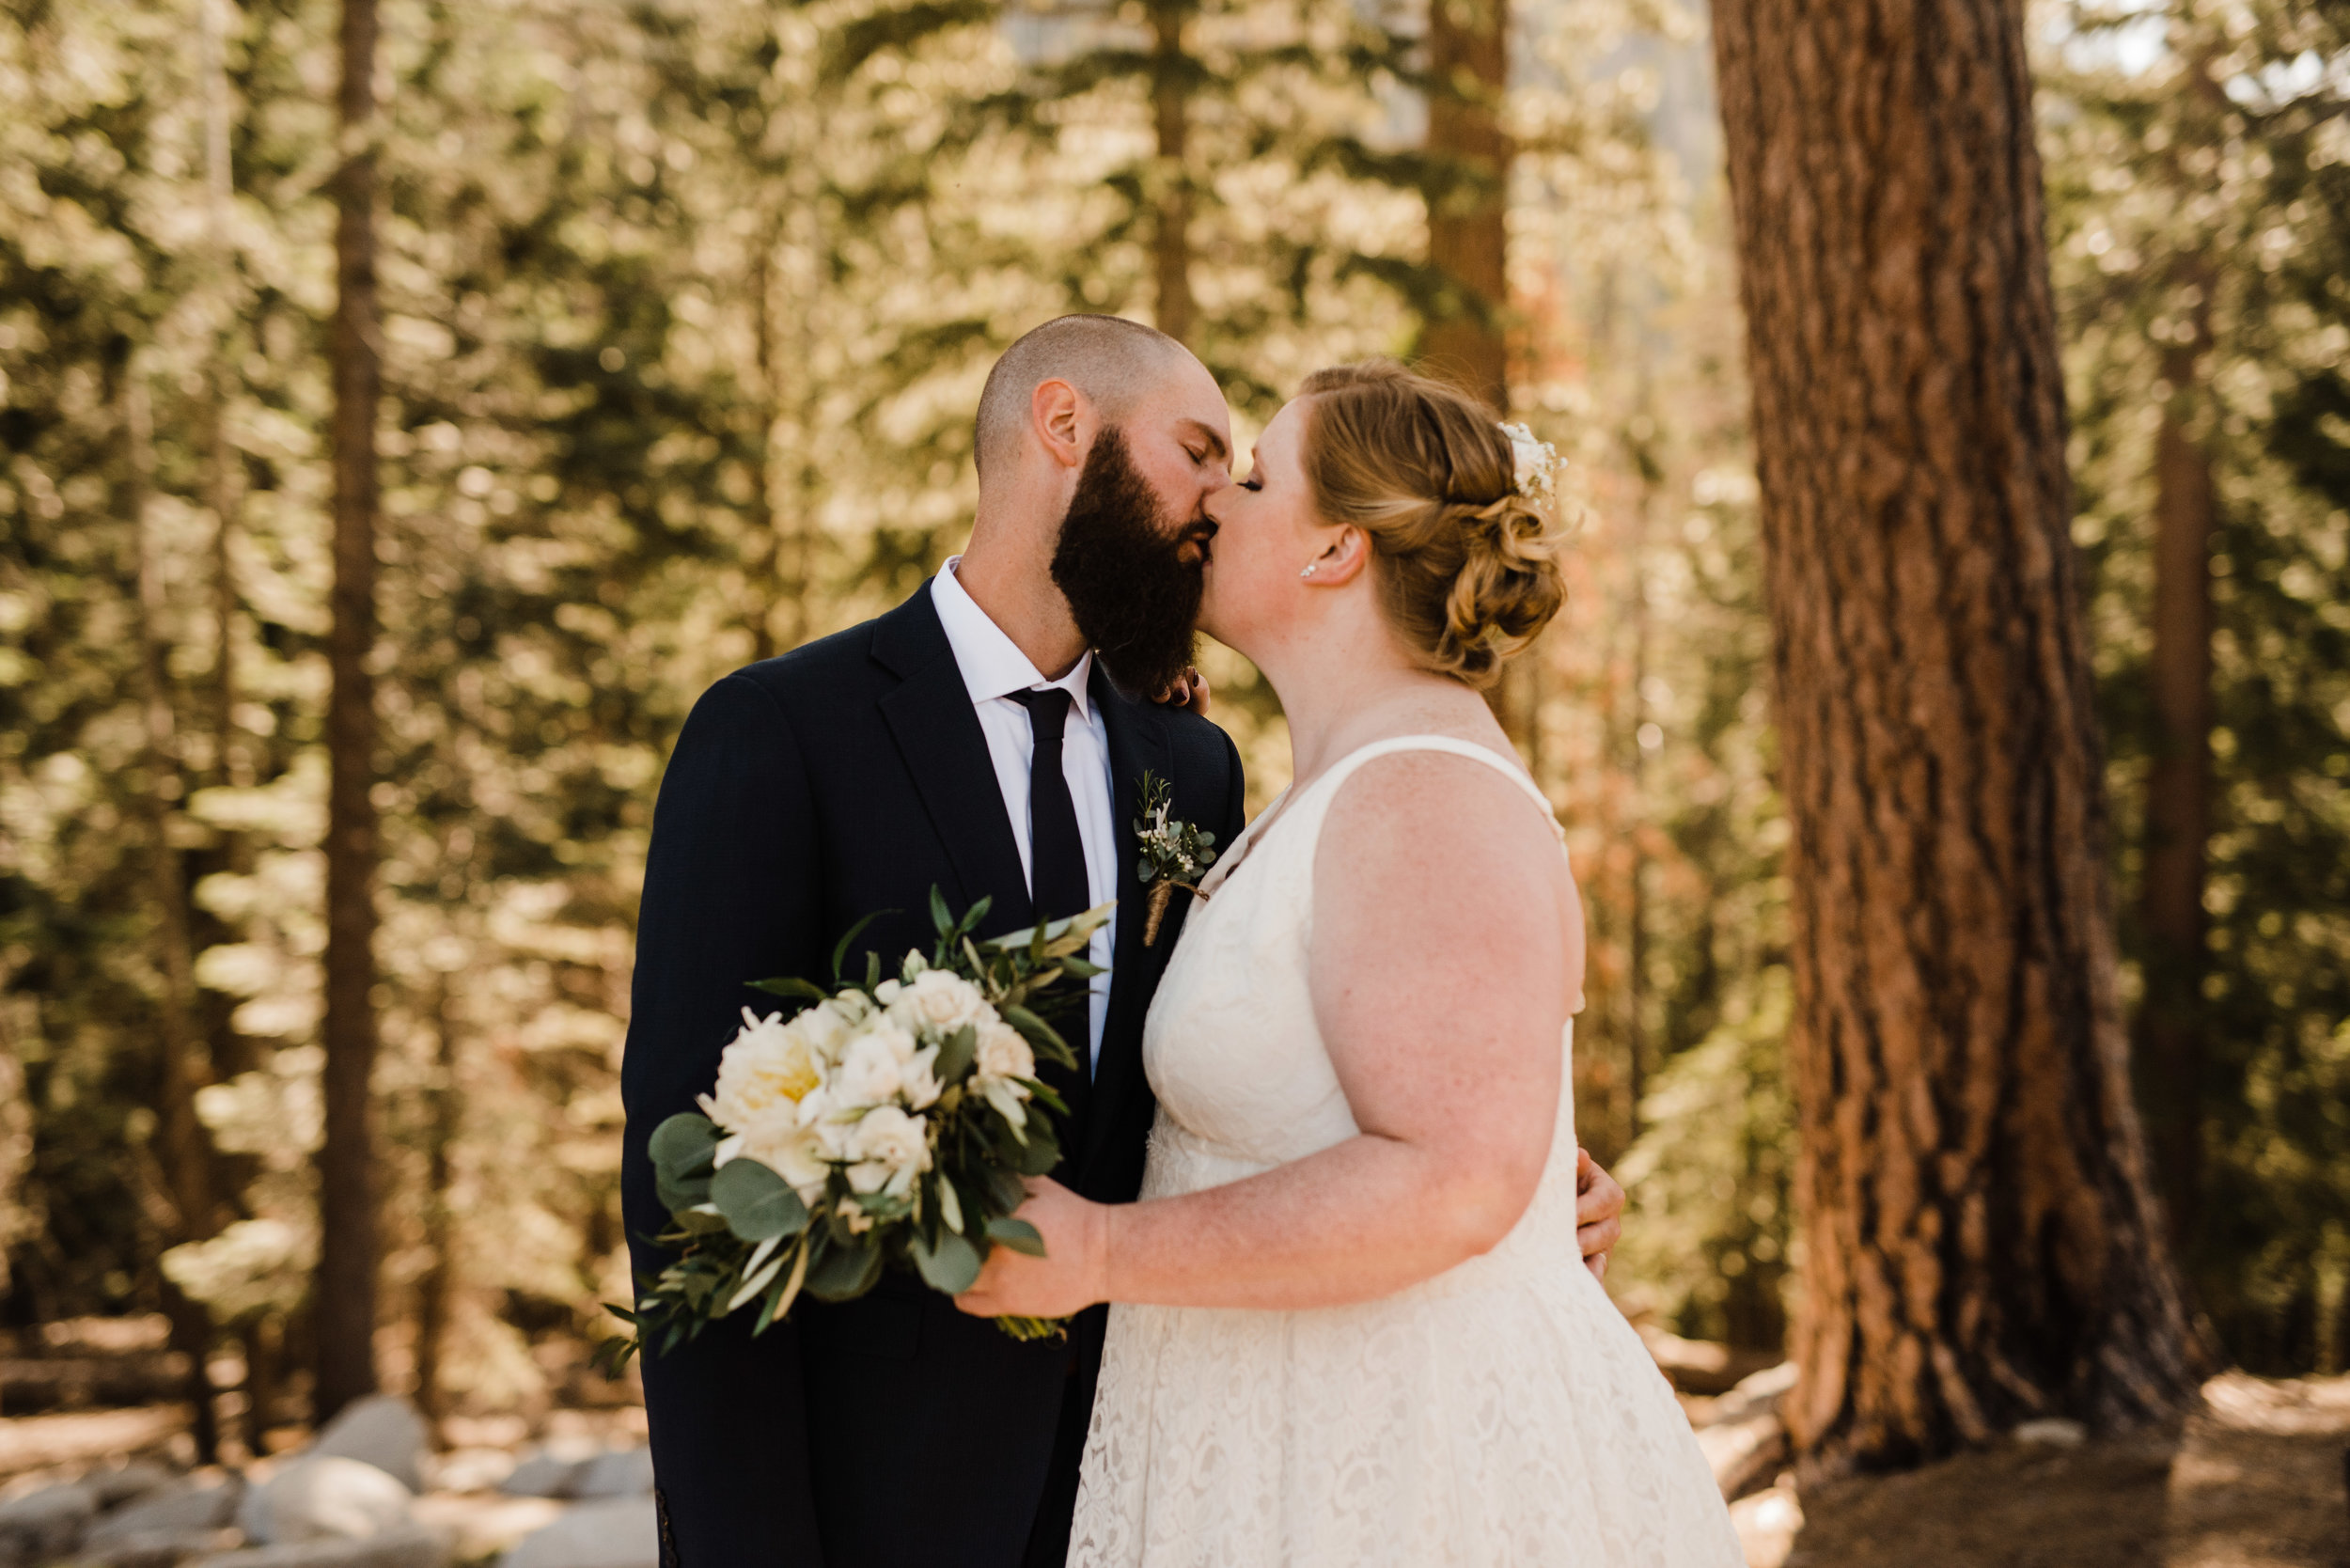 Summer Bride and Groom at Yosemite National Park